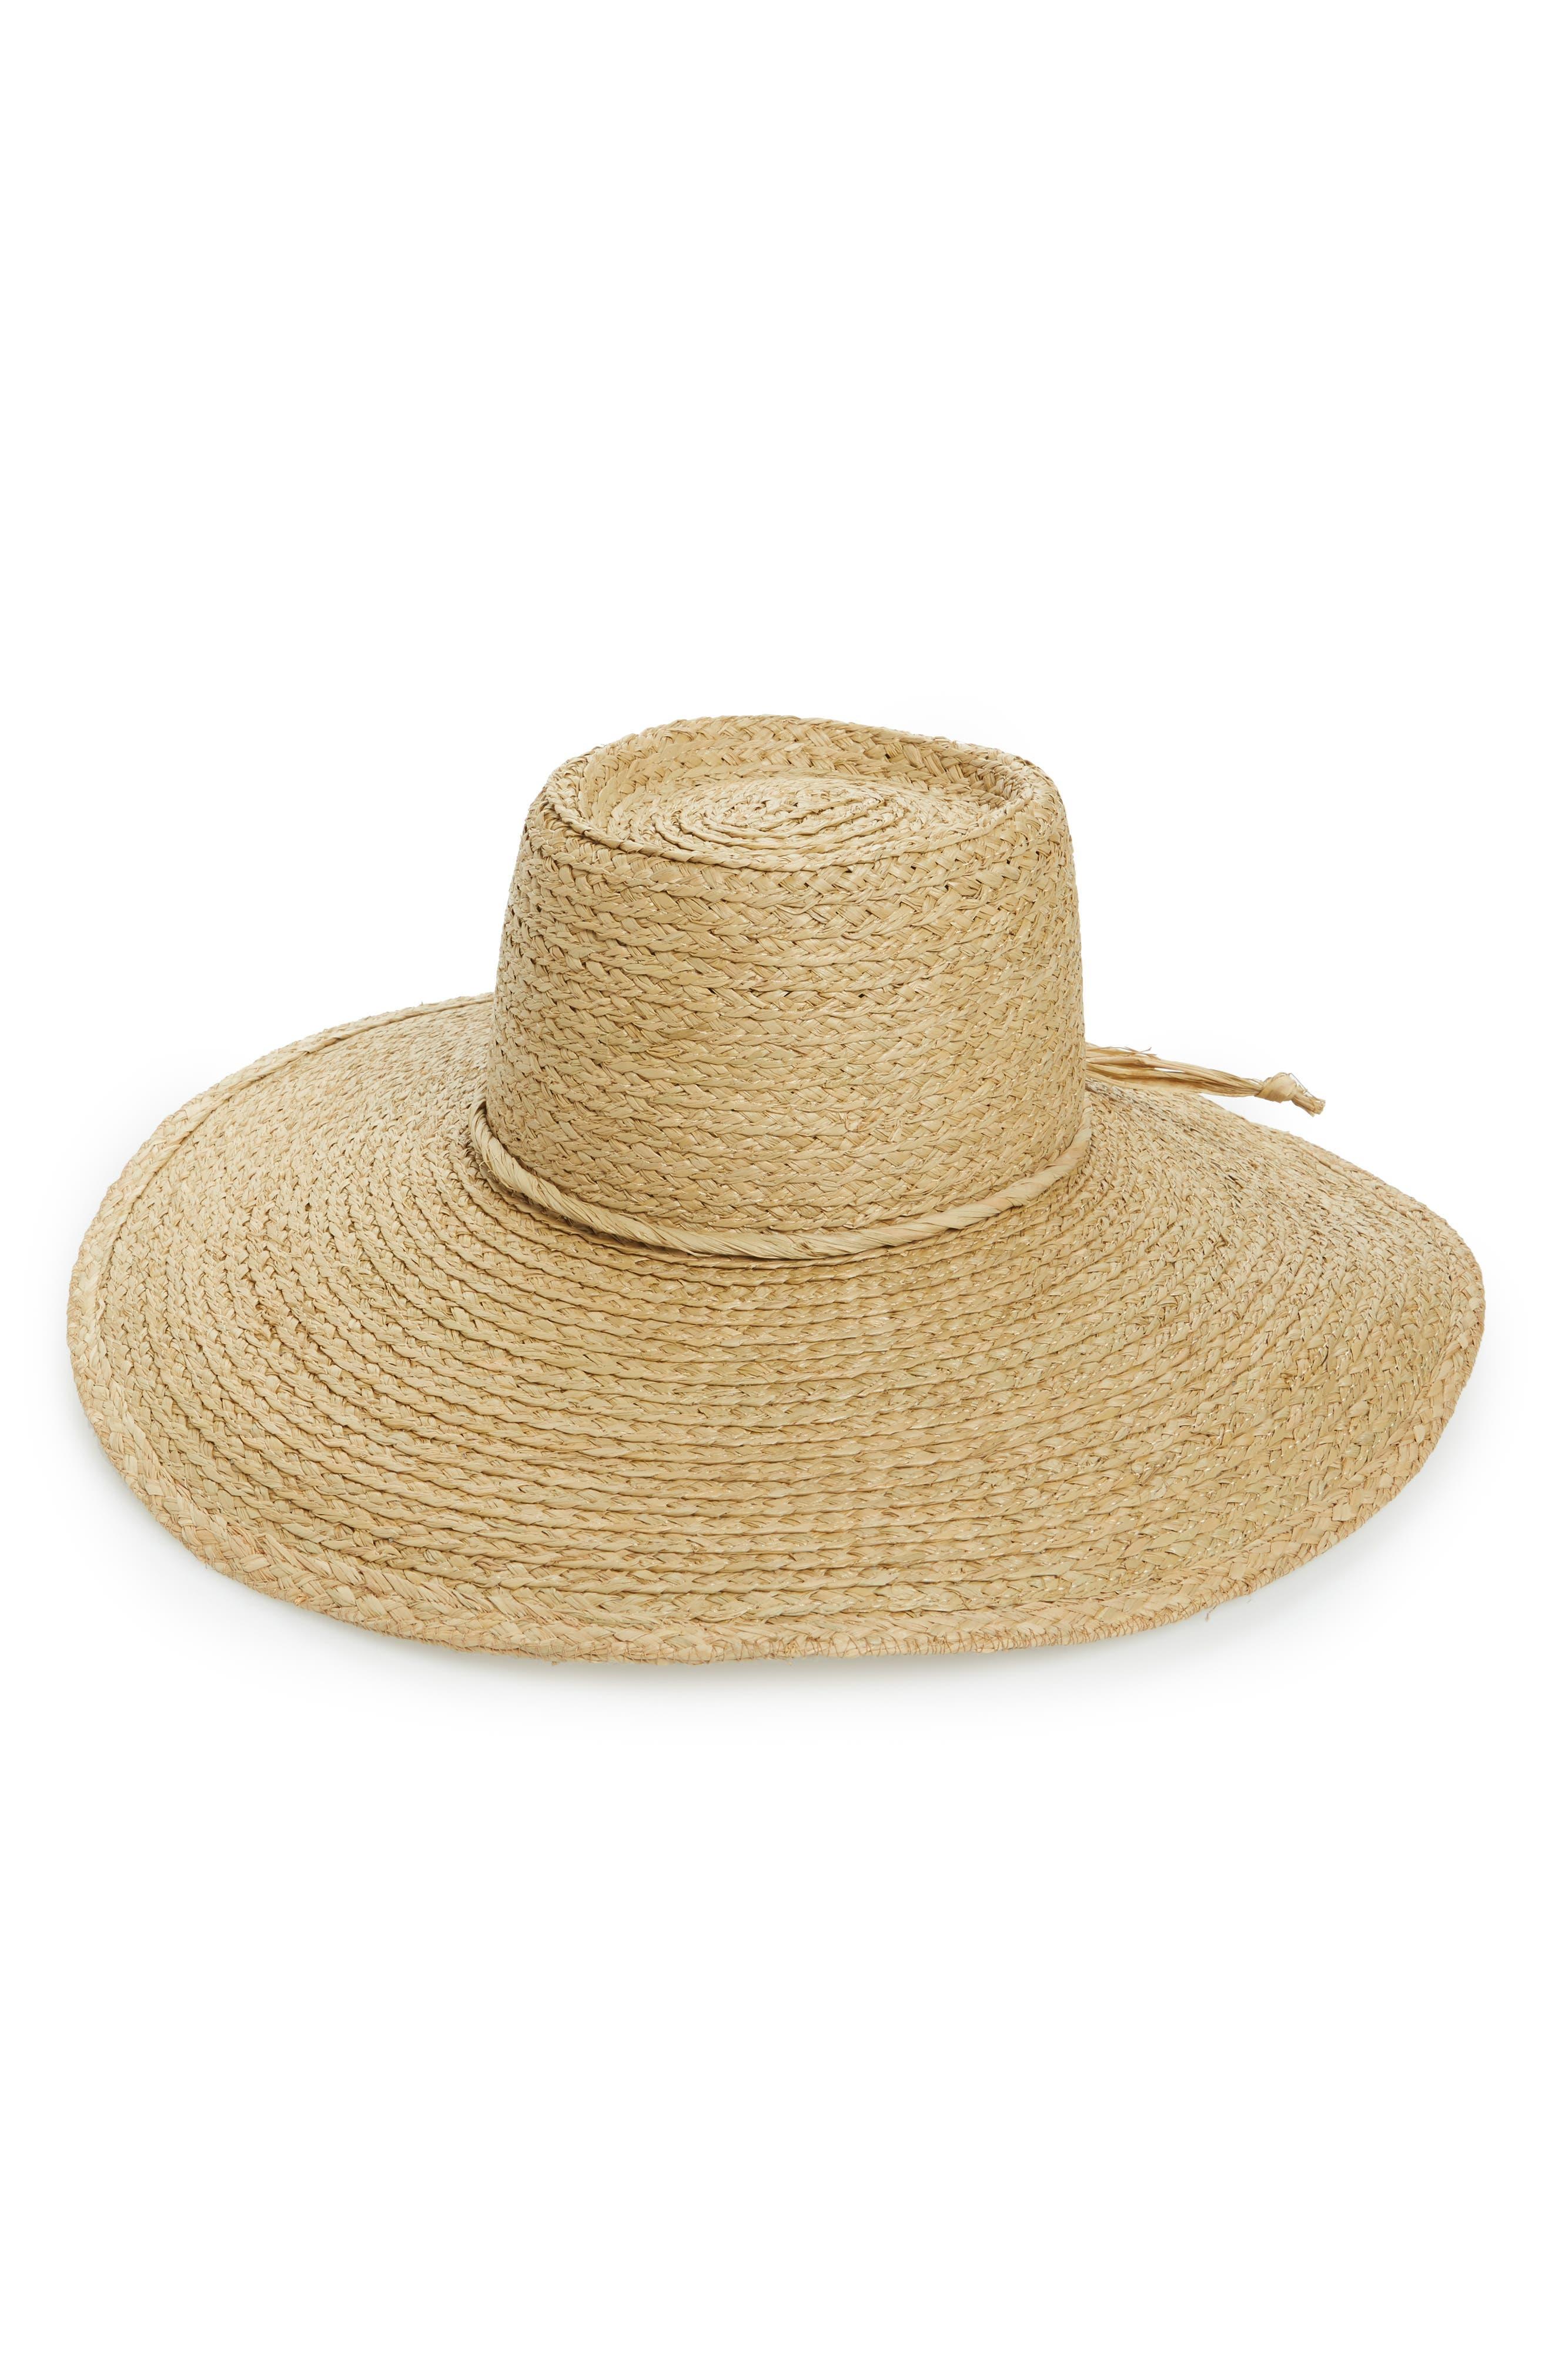 Main Image - Brixton Paite Raffia Floppy Hat